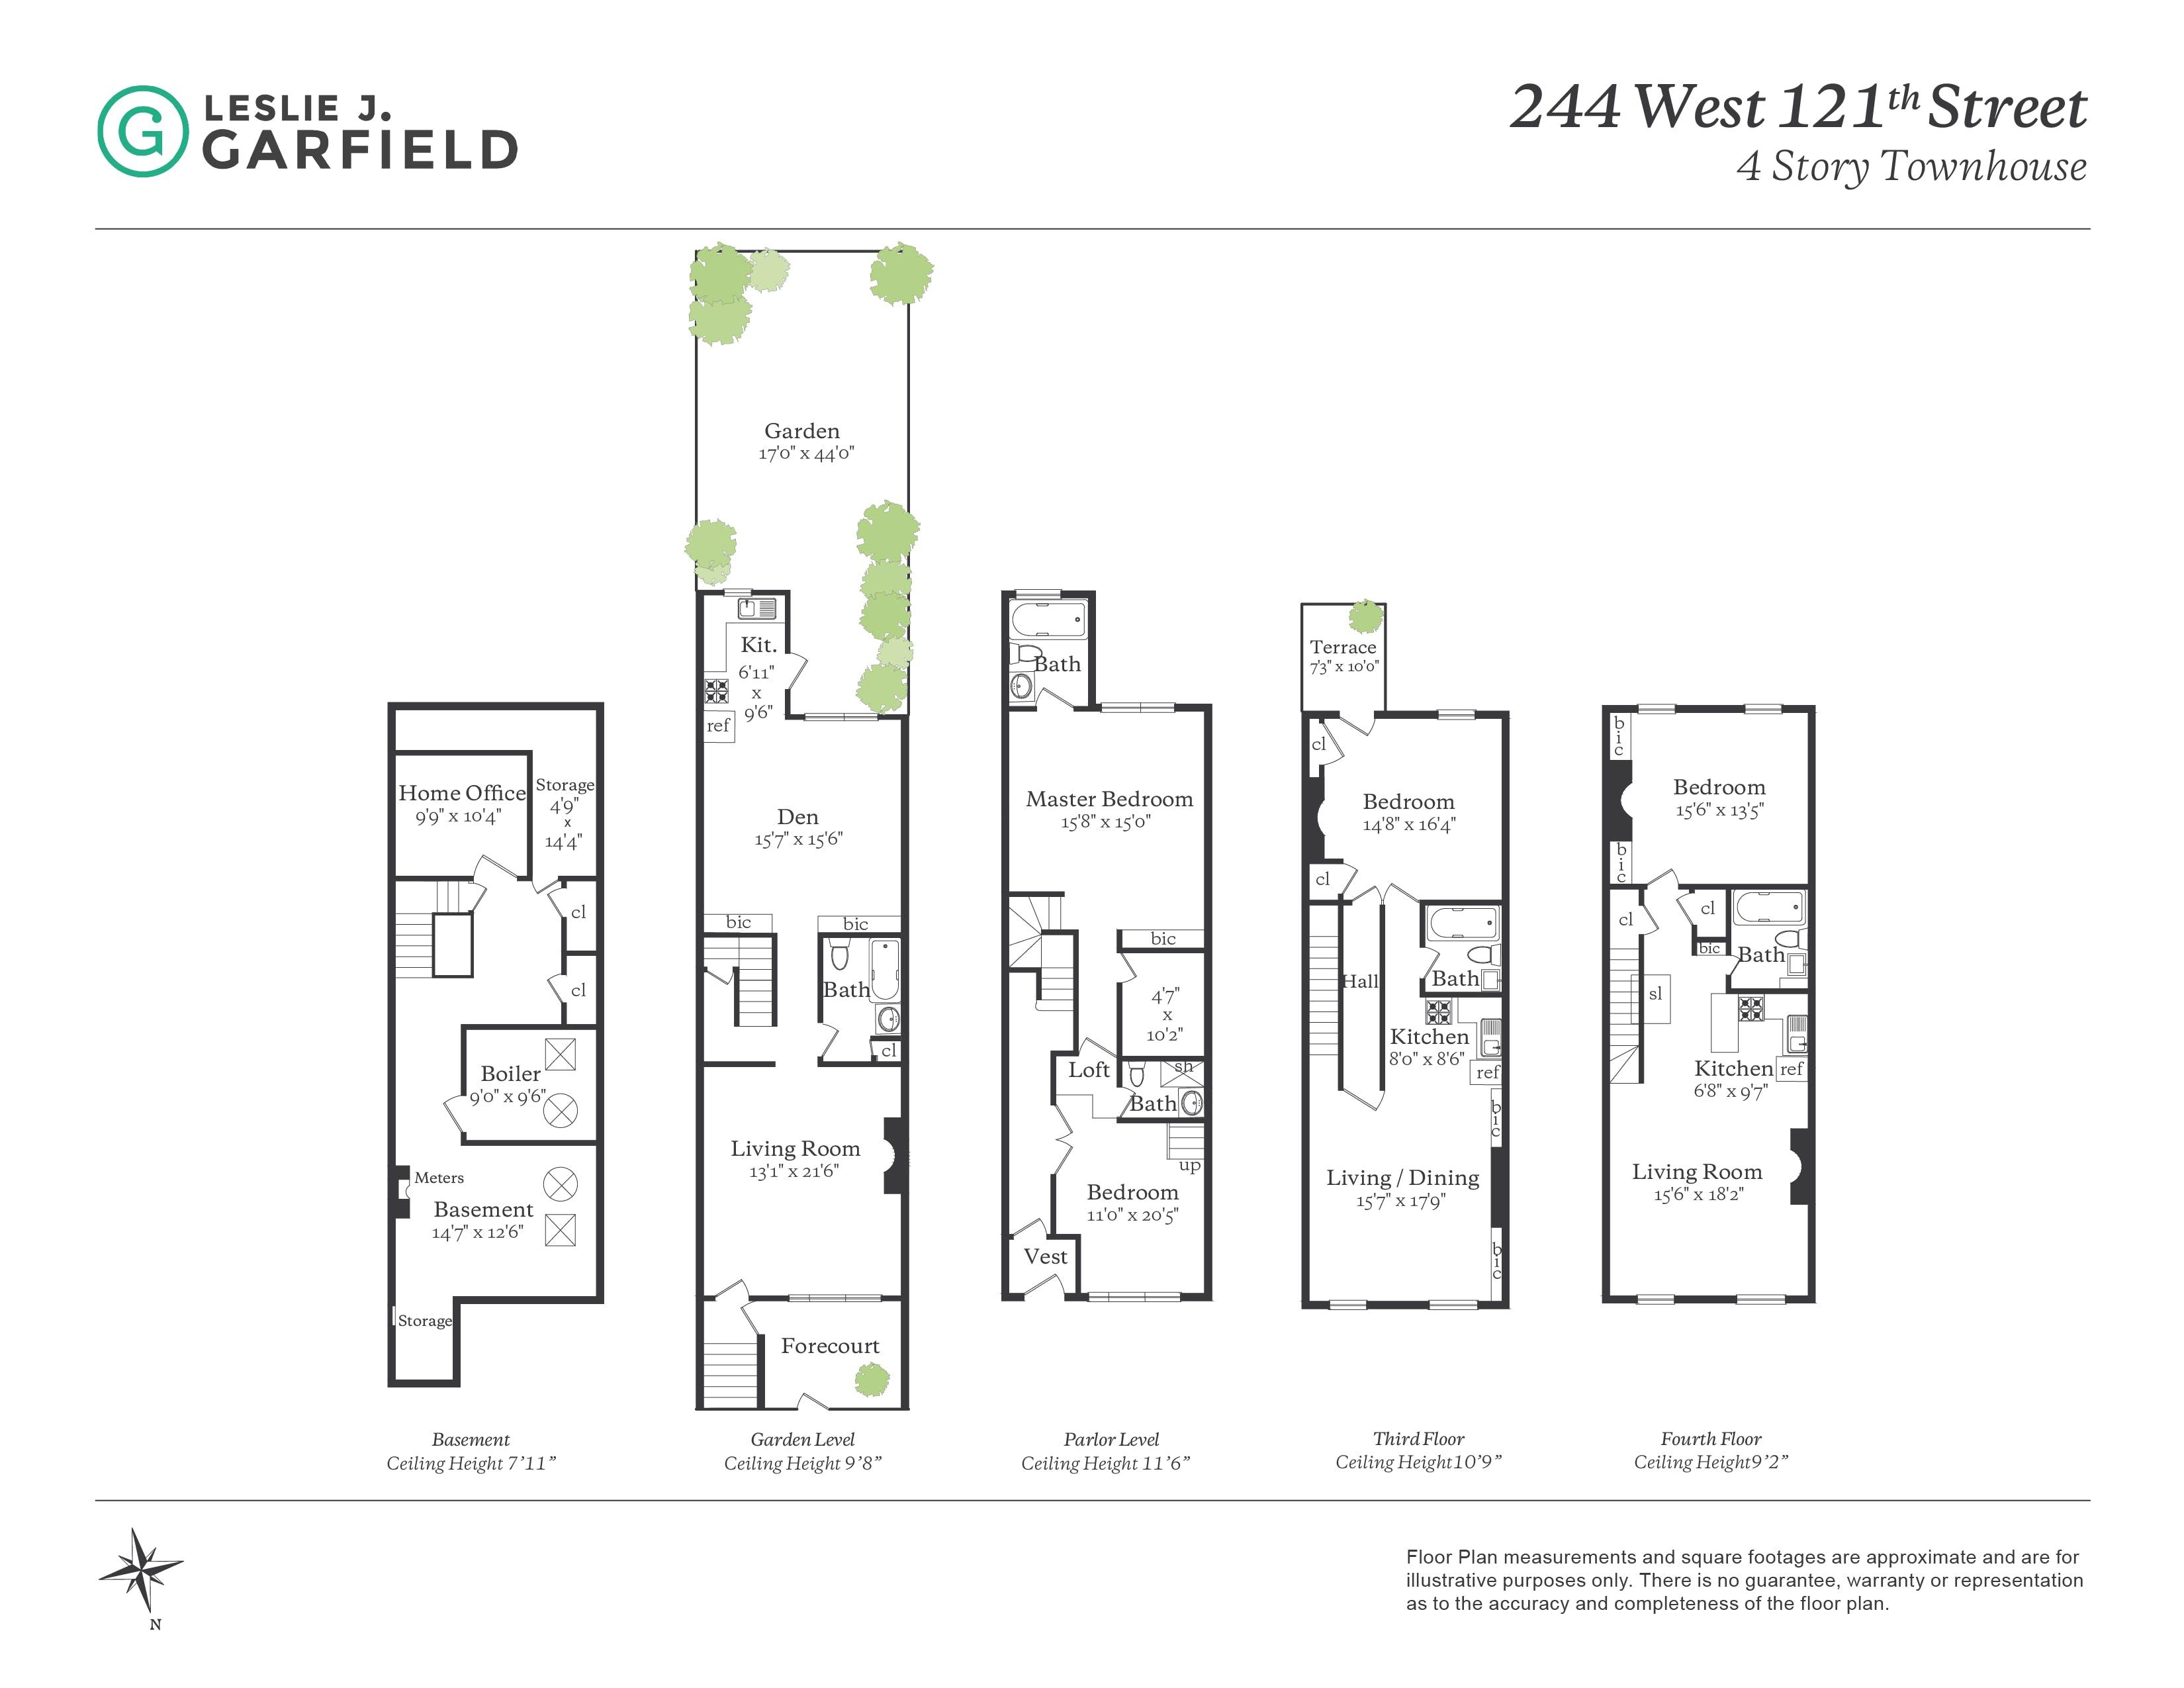 244 West 121st Street - 1dae02eb-dd72-426b-826d-0ece75c02207 - New York City Townhouse Real Estate